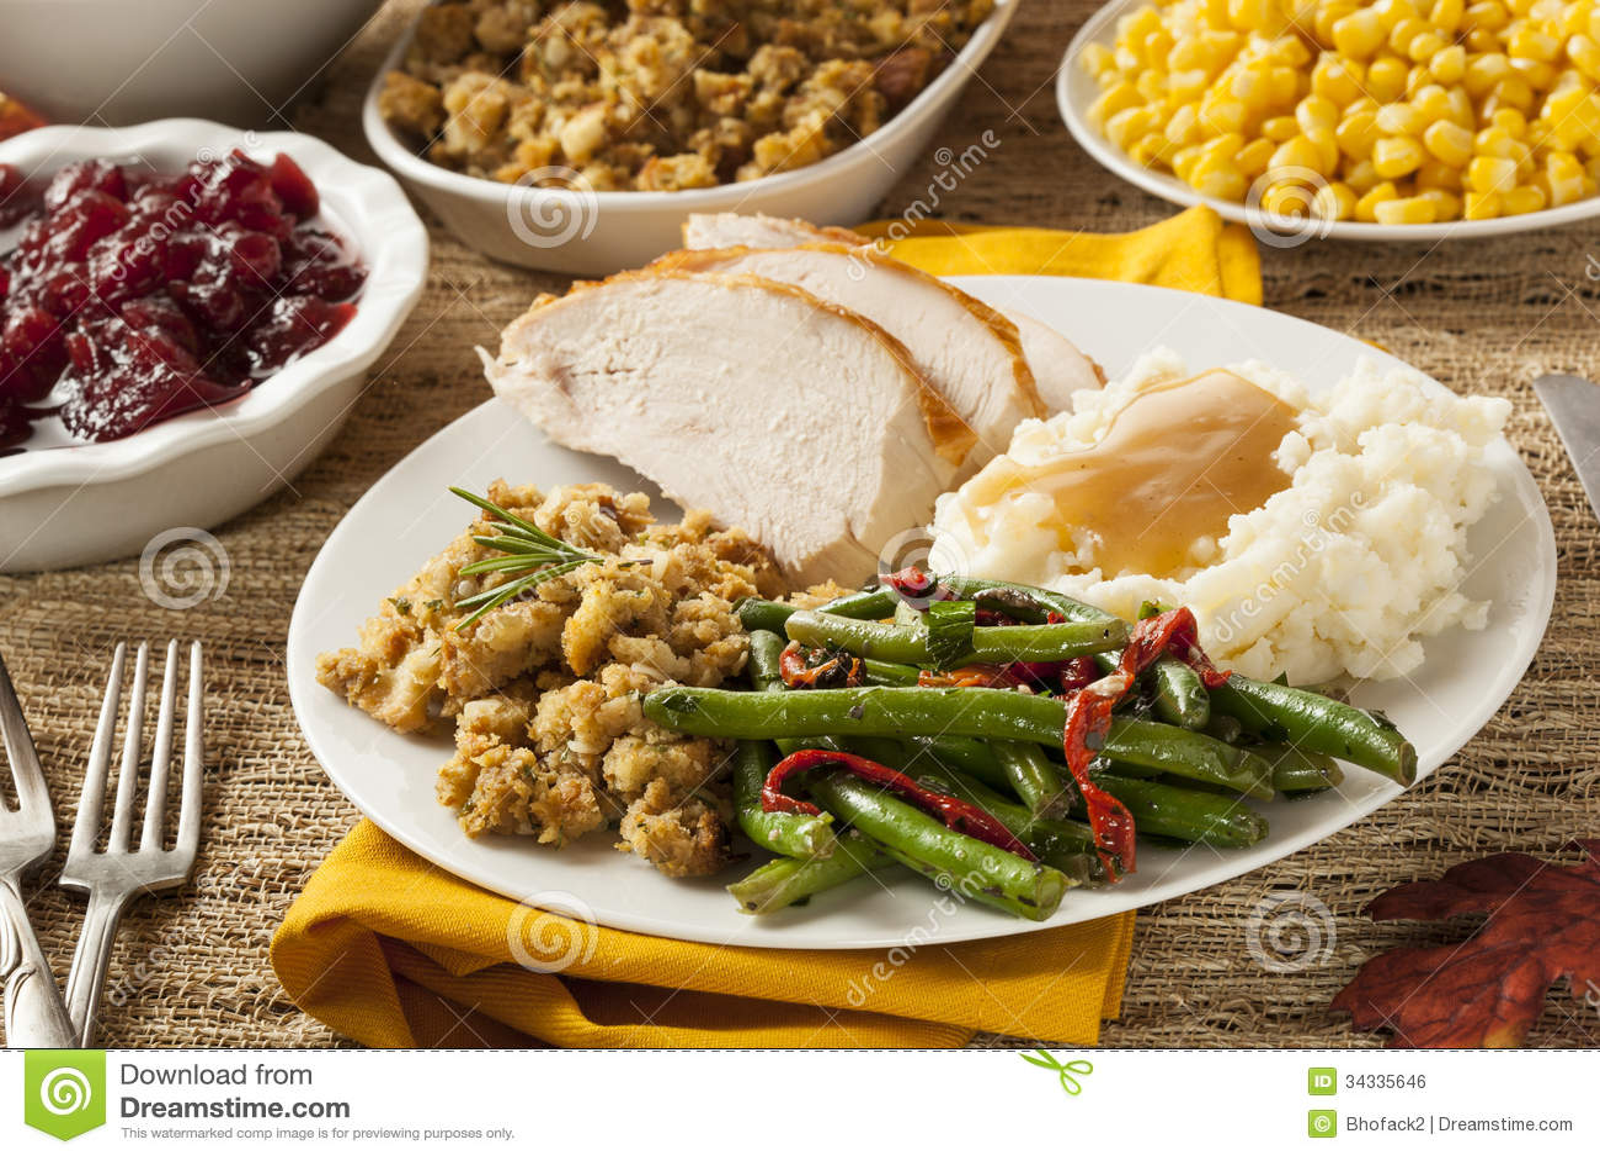 Homemade turkey thanksgiving dinner royalty free stock for What to have for thanksgiving dinner